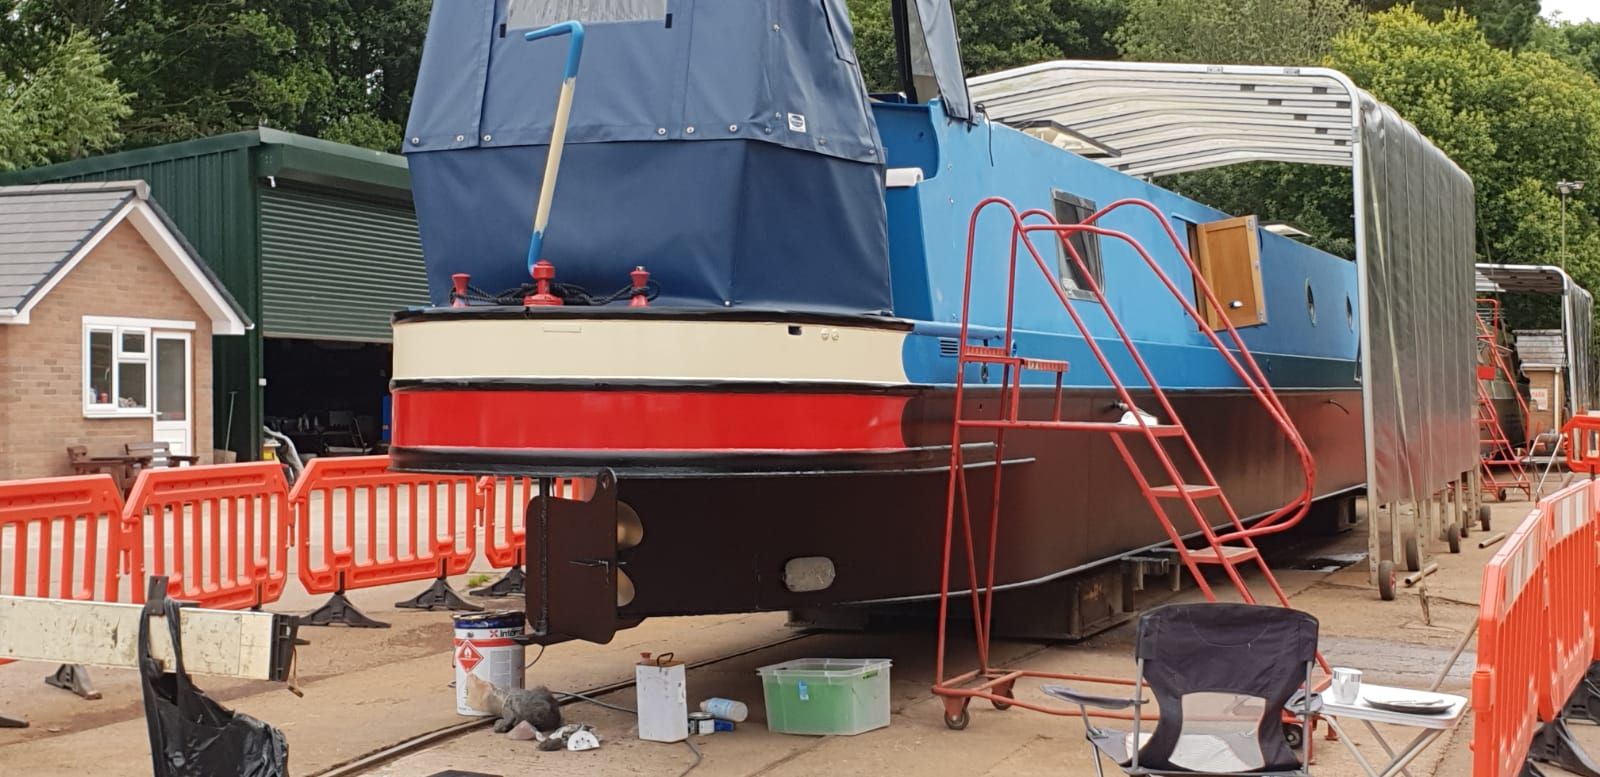 Narrowboat being primed